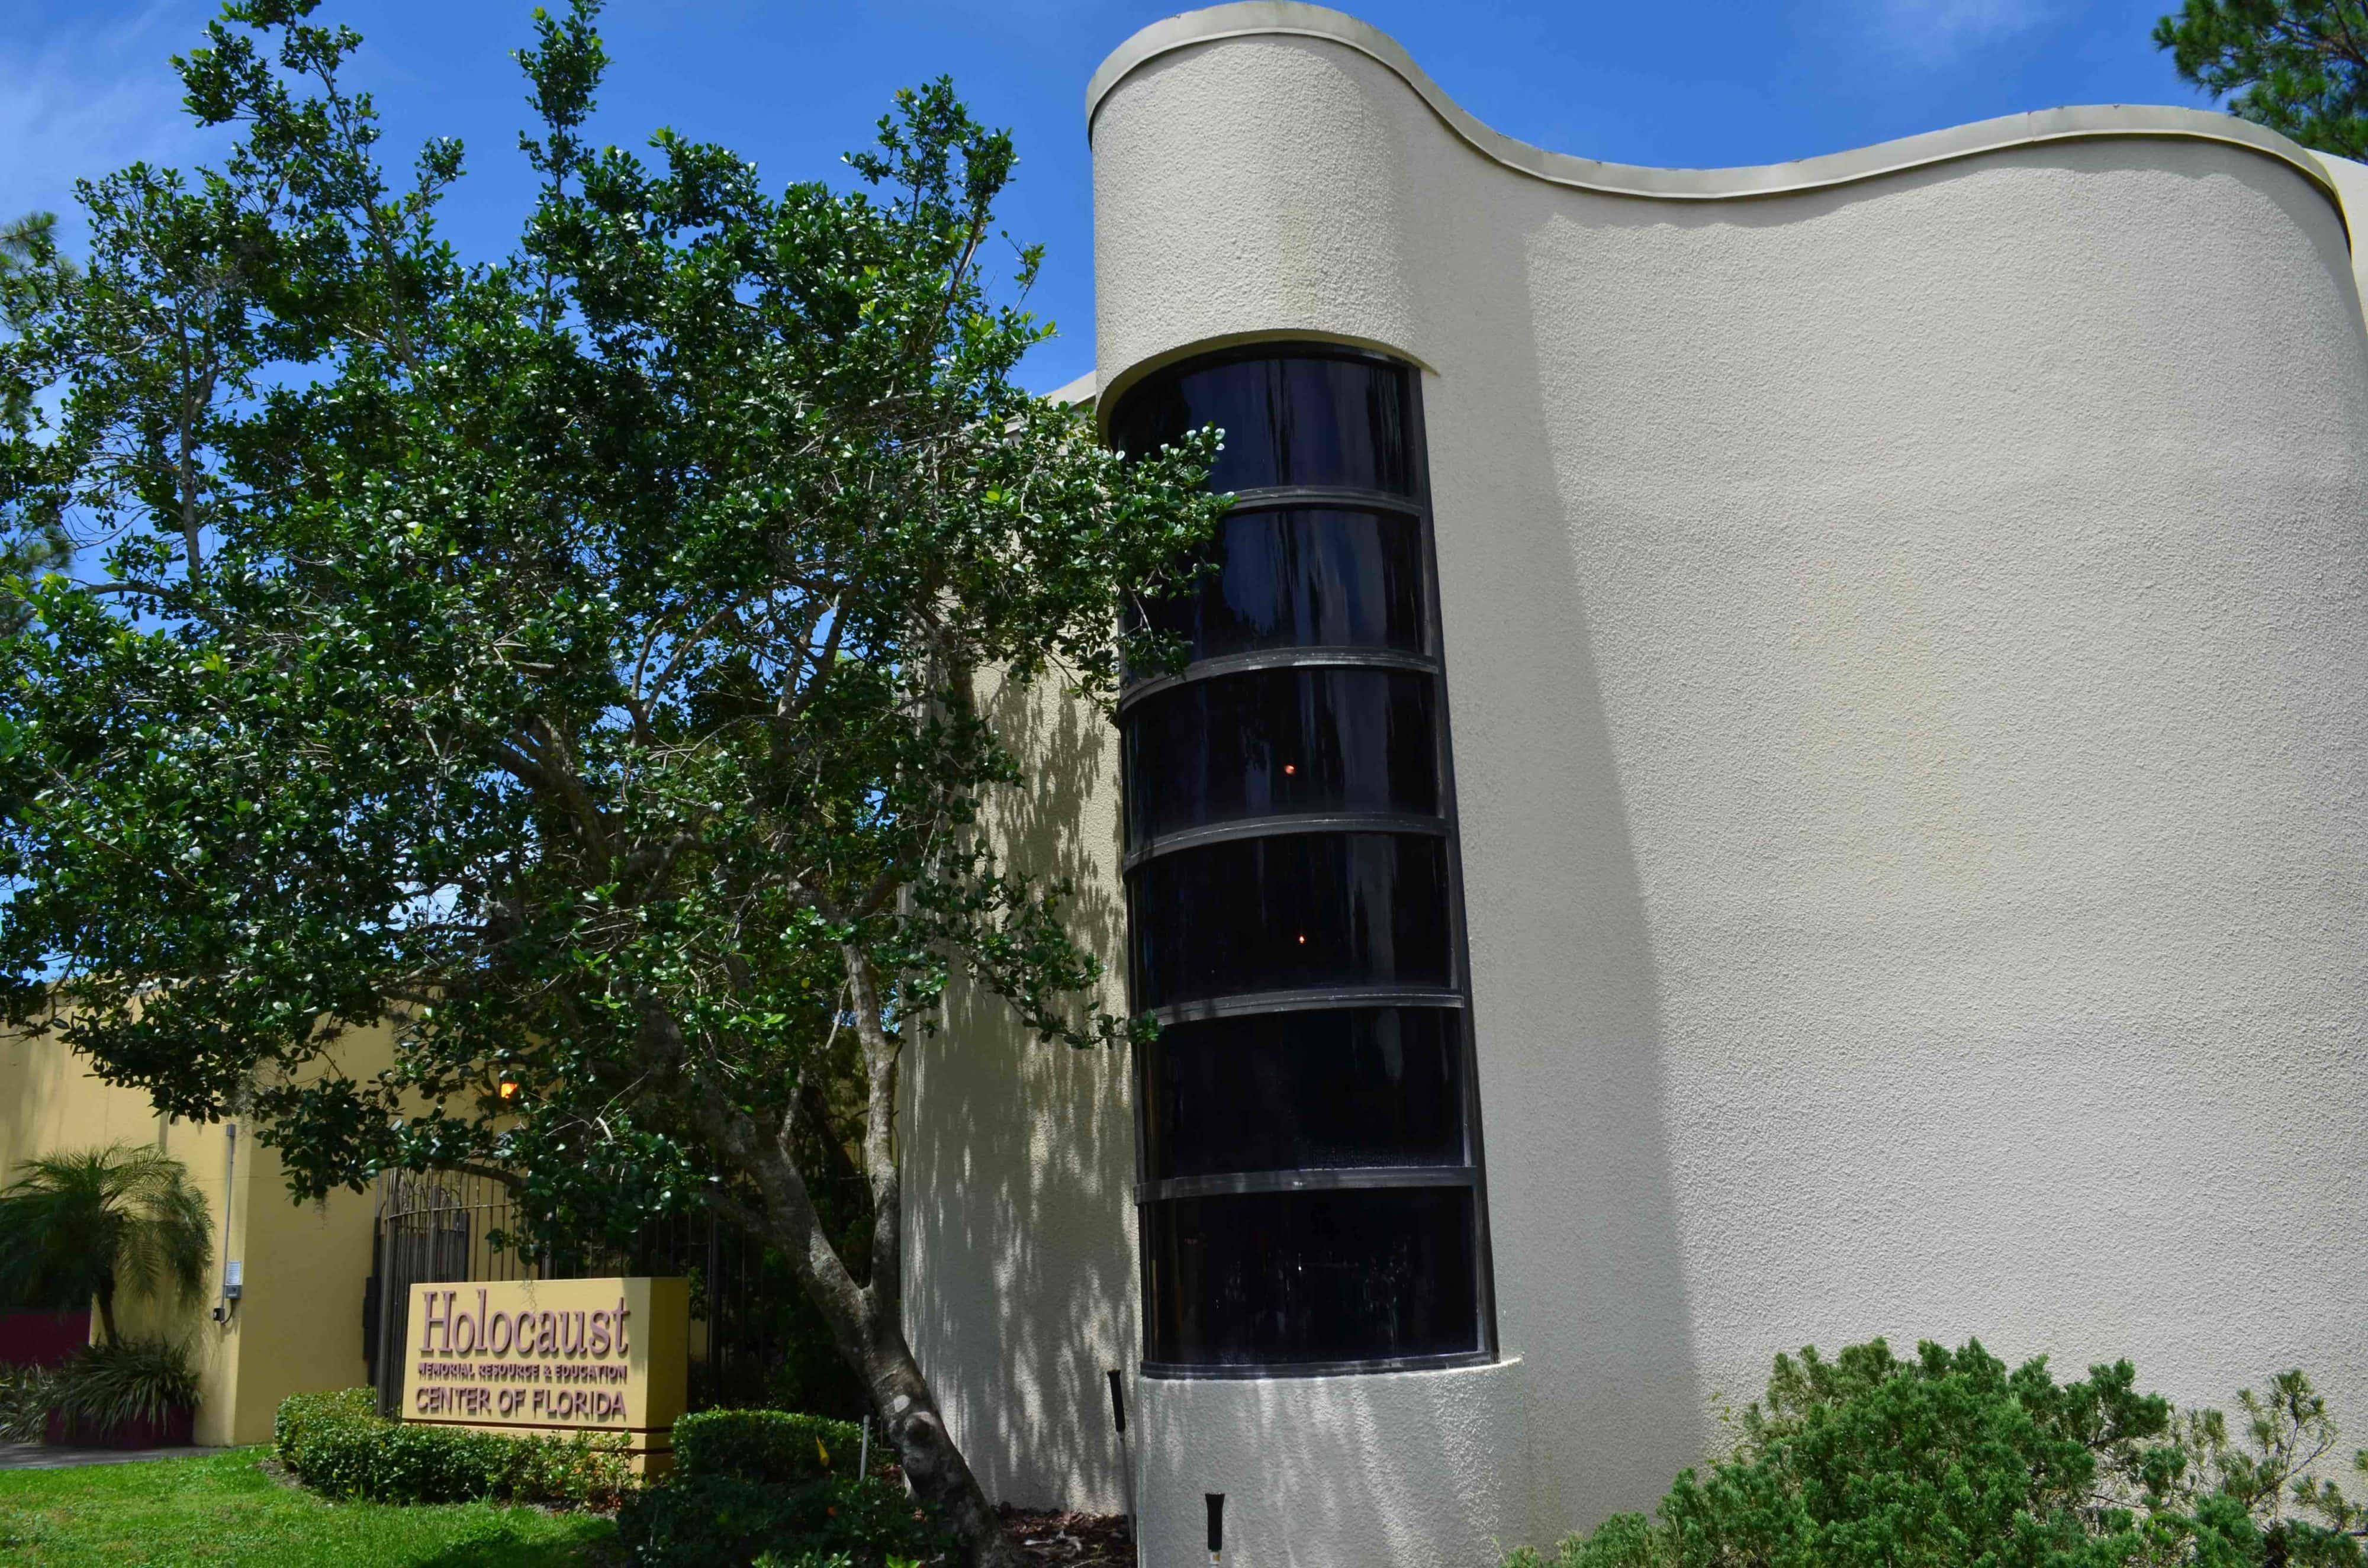 Holocaust-Memorial-Resource-Education-Center-of-Florida-4000x2649.jpg